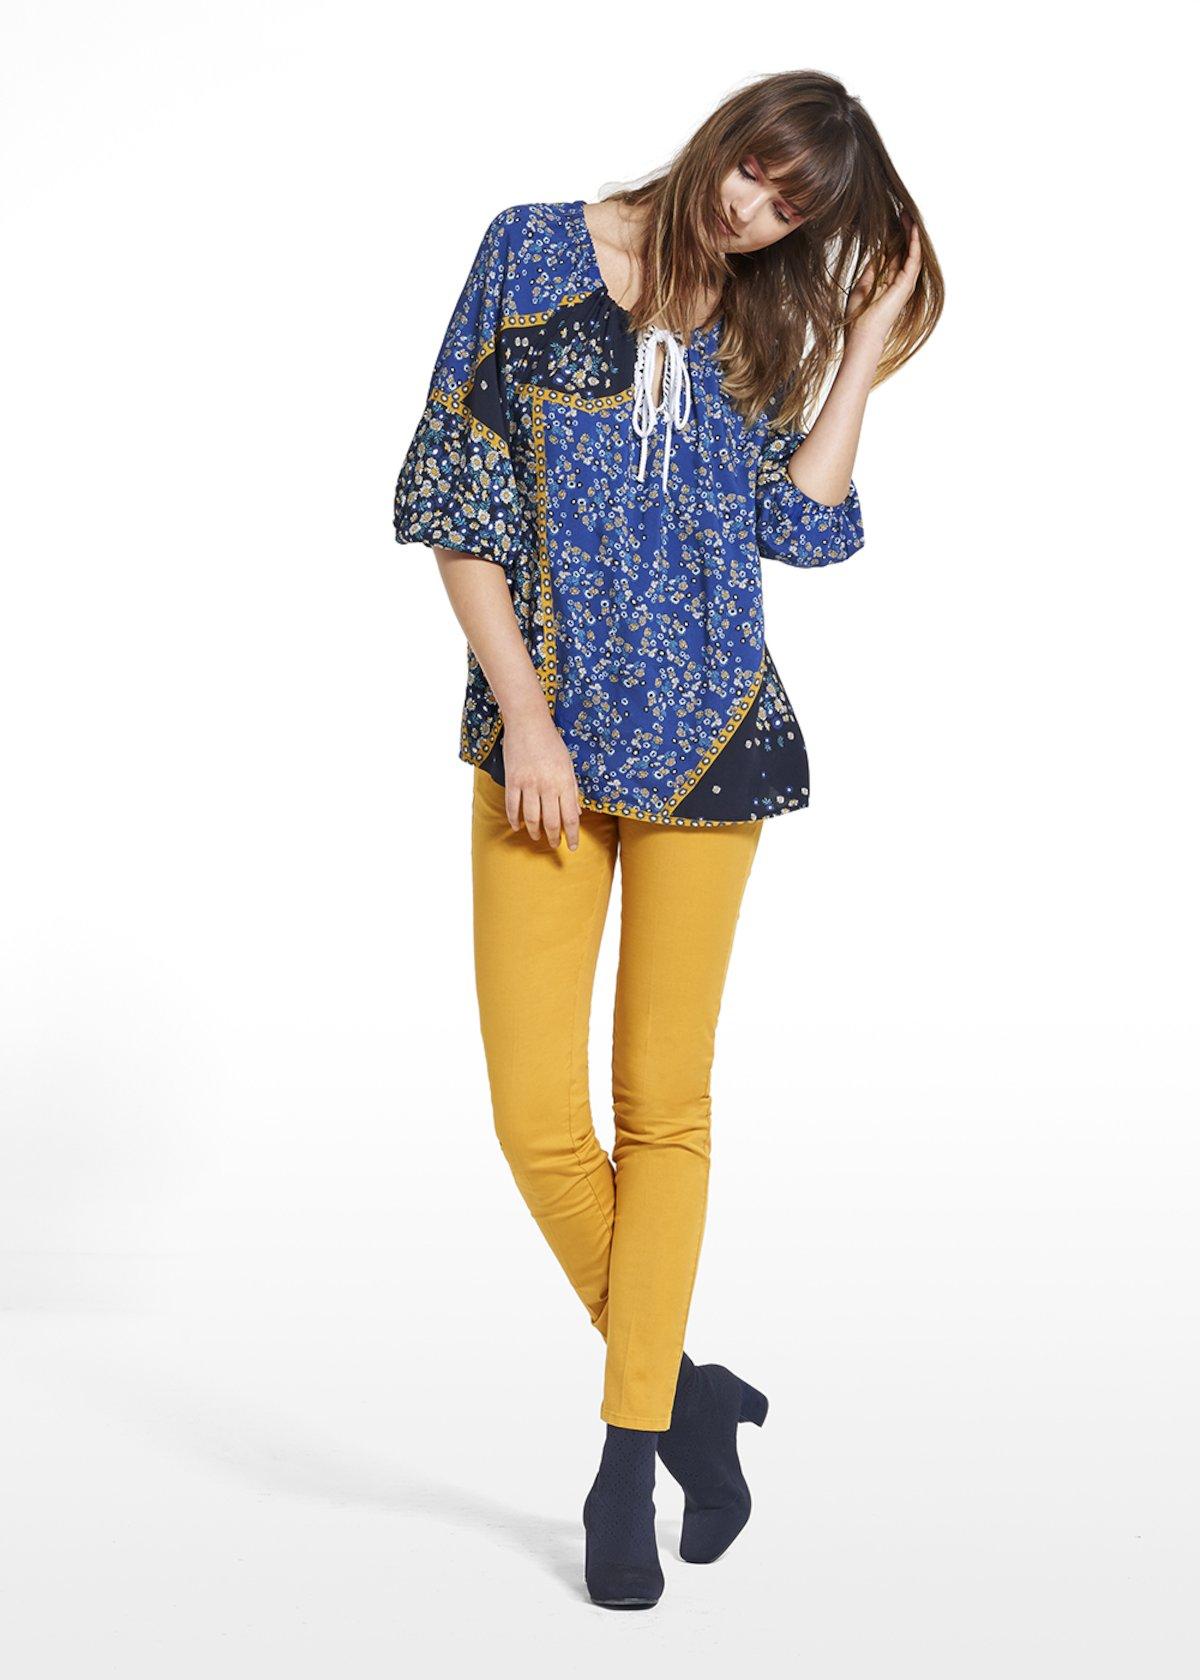 Blouse Cory patterned gipsy daisy - Avion / Miele Fantasia - Woman